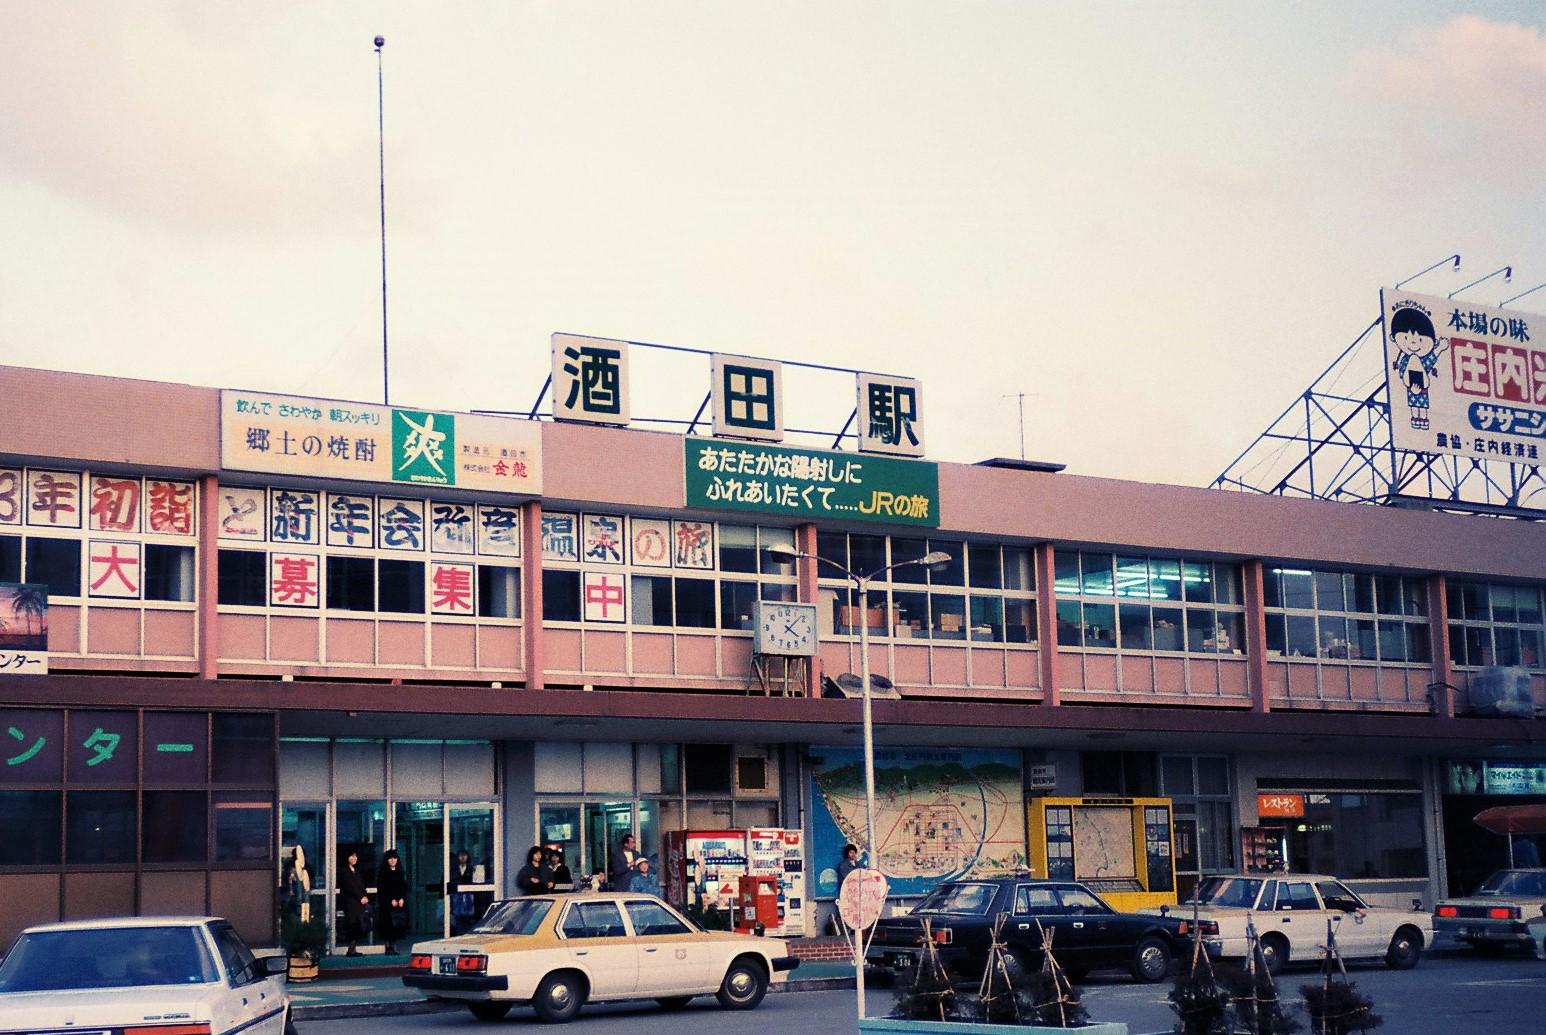 https://upload.wikimedia.org/wikipedia/commons/f/f3/Sakata_Station_19871227.jpg